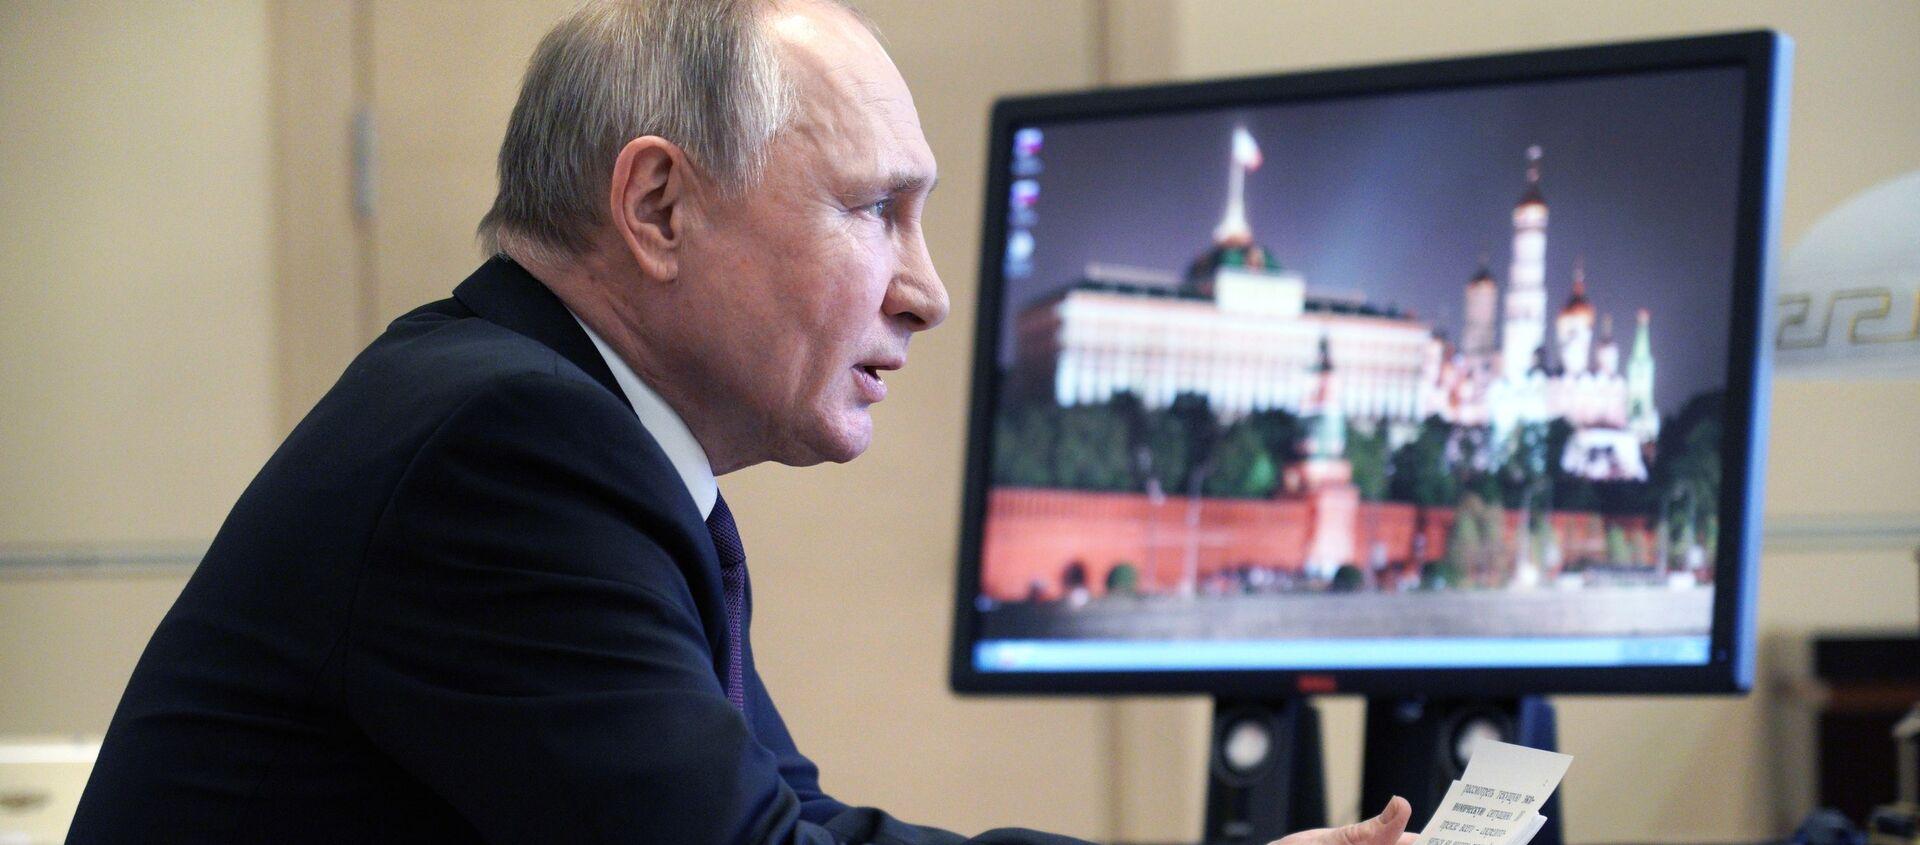 Władimir Putin, a w tle fotografia Kremla - Sputnik Polska, 1920, 16.03.2021